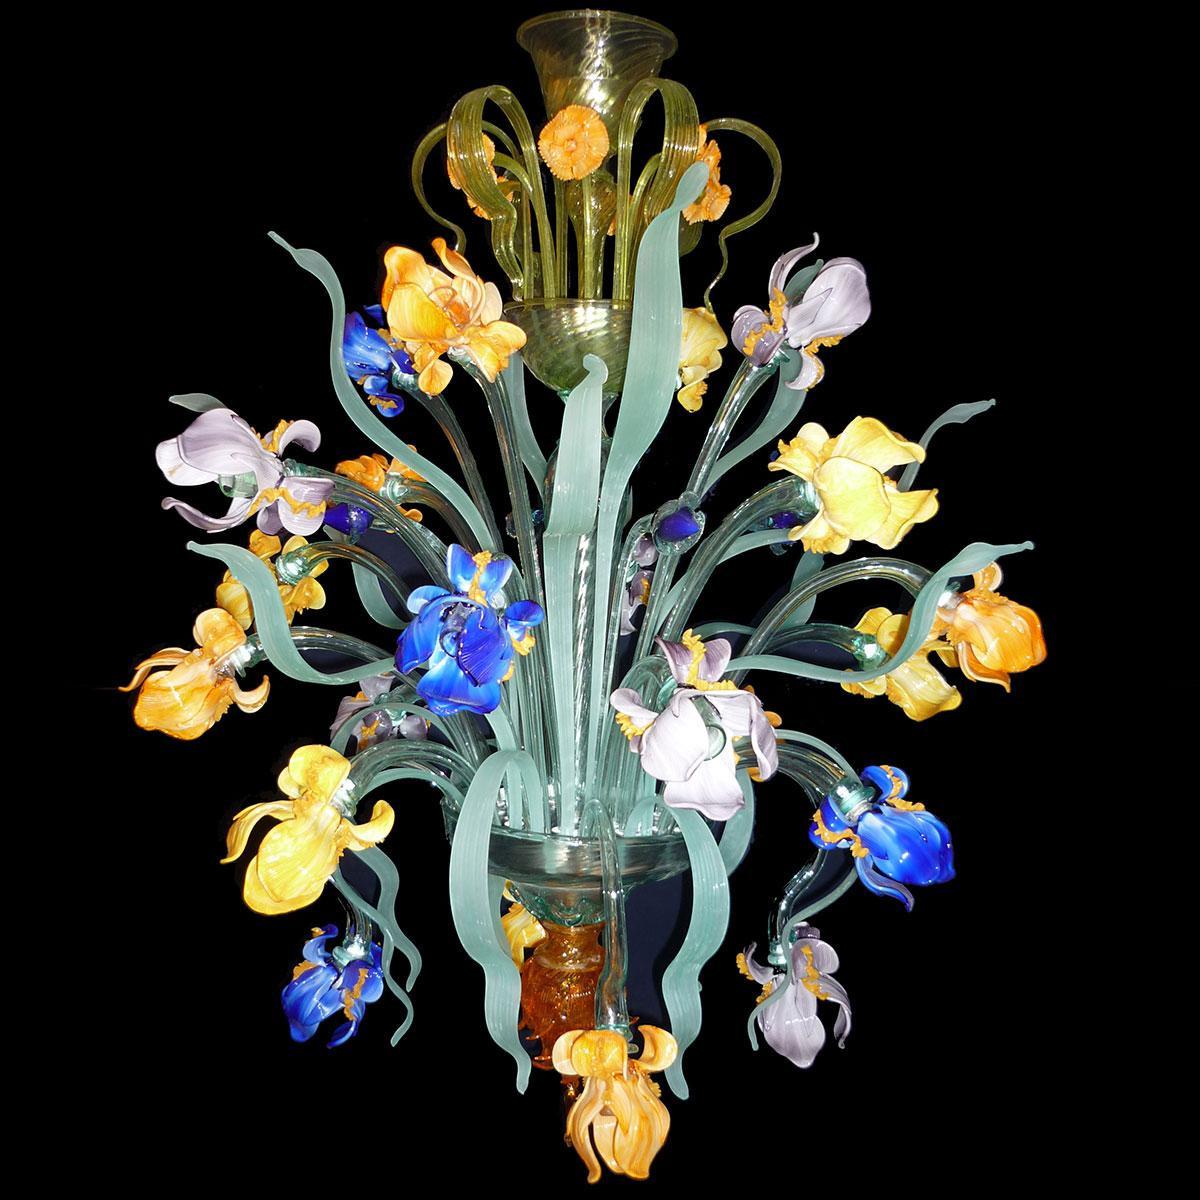 """Iris di Van Gogh"" Murano glass chandelier - 24 lights - multicolor"